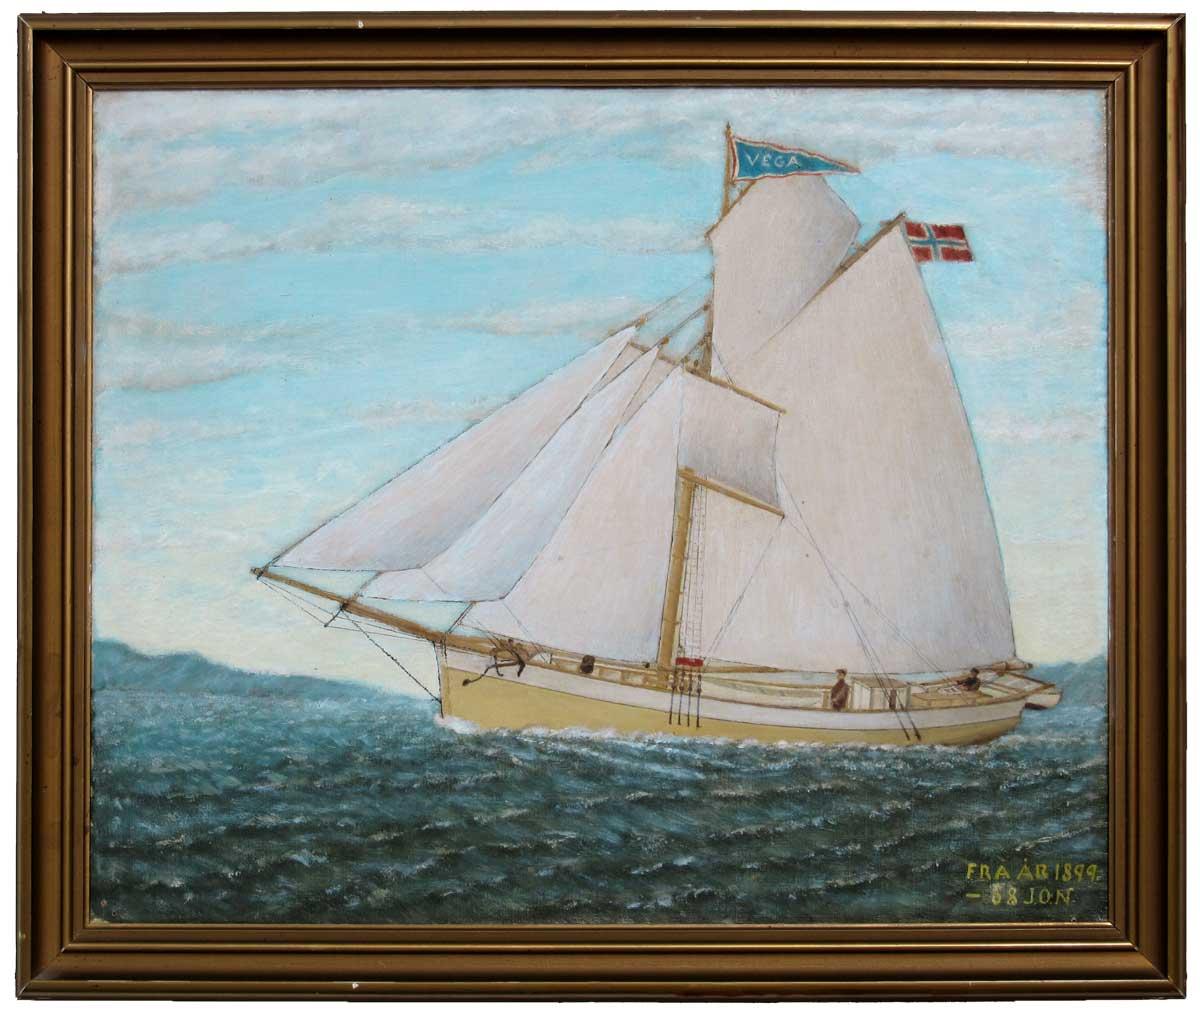 Painting of Historic Vessel Vega in 1899